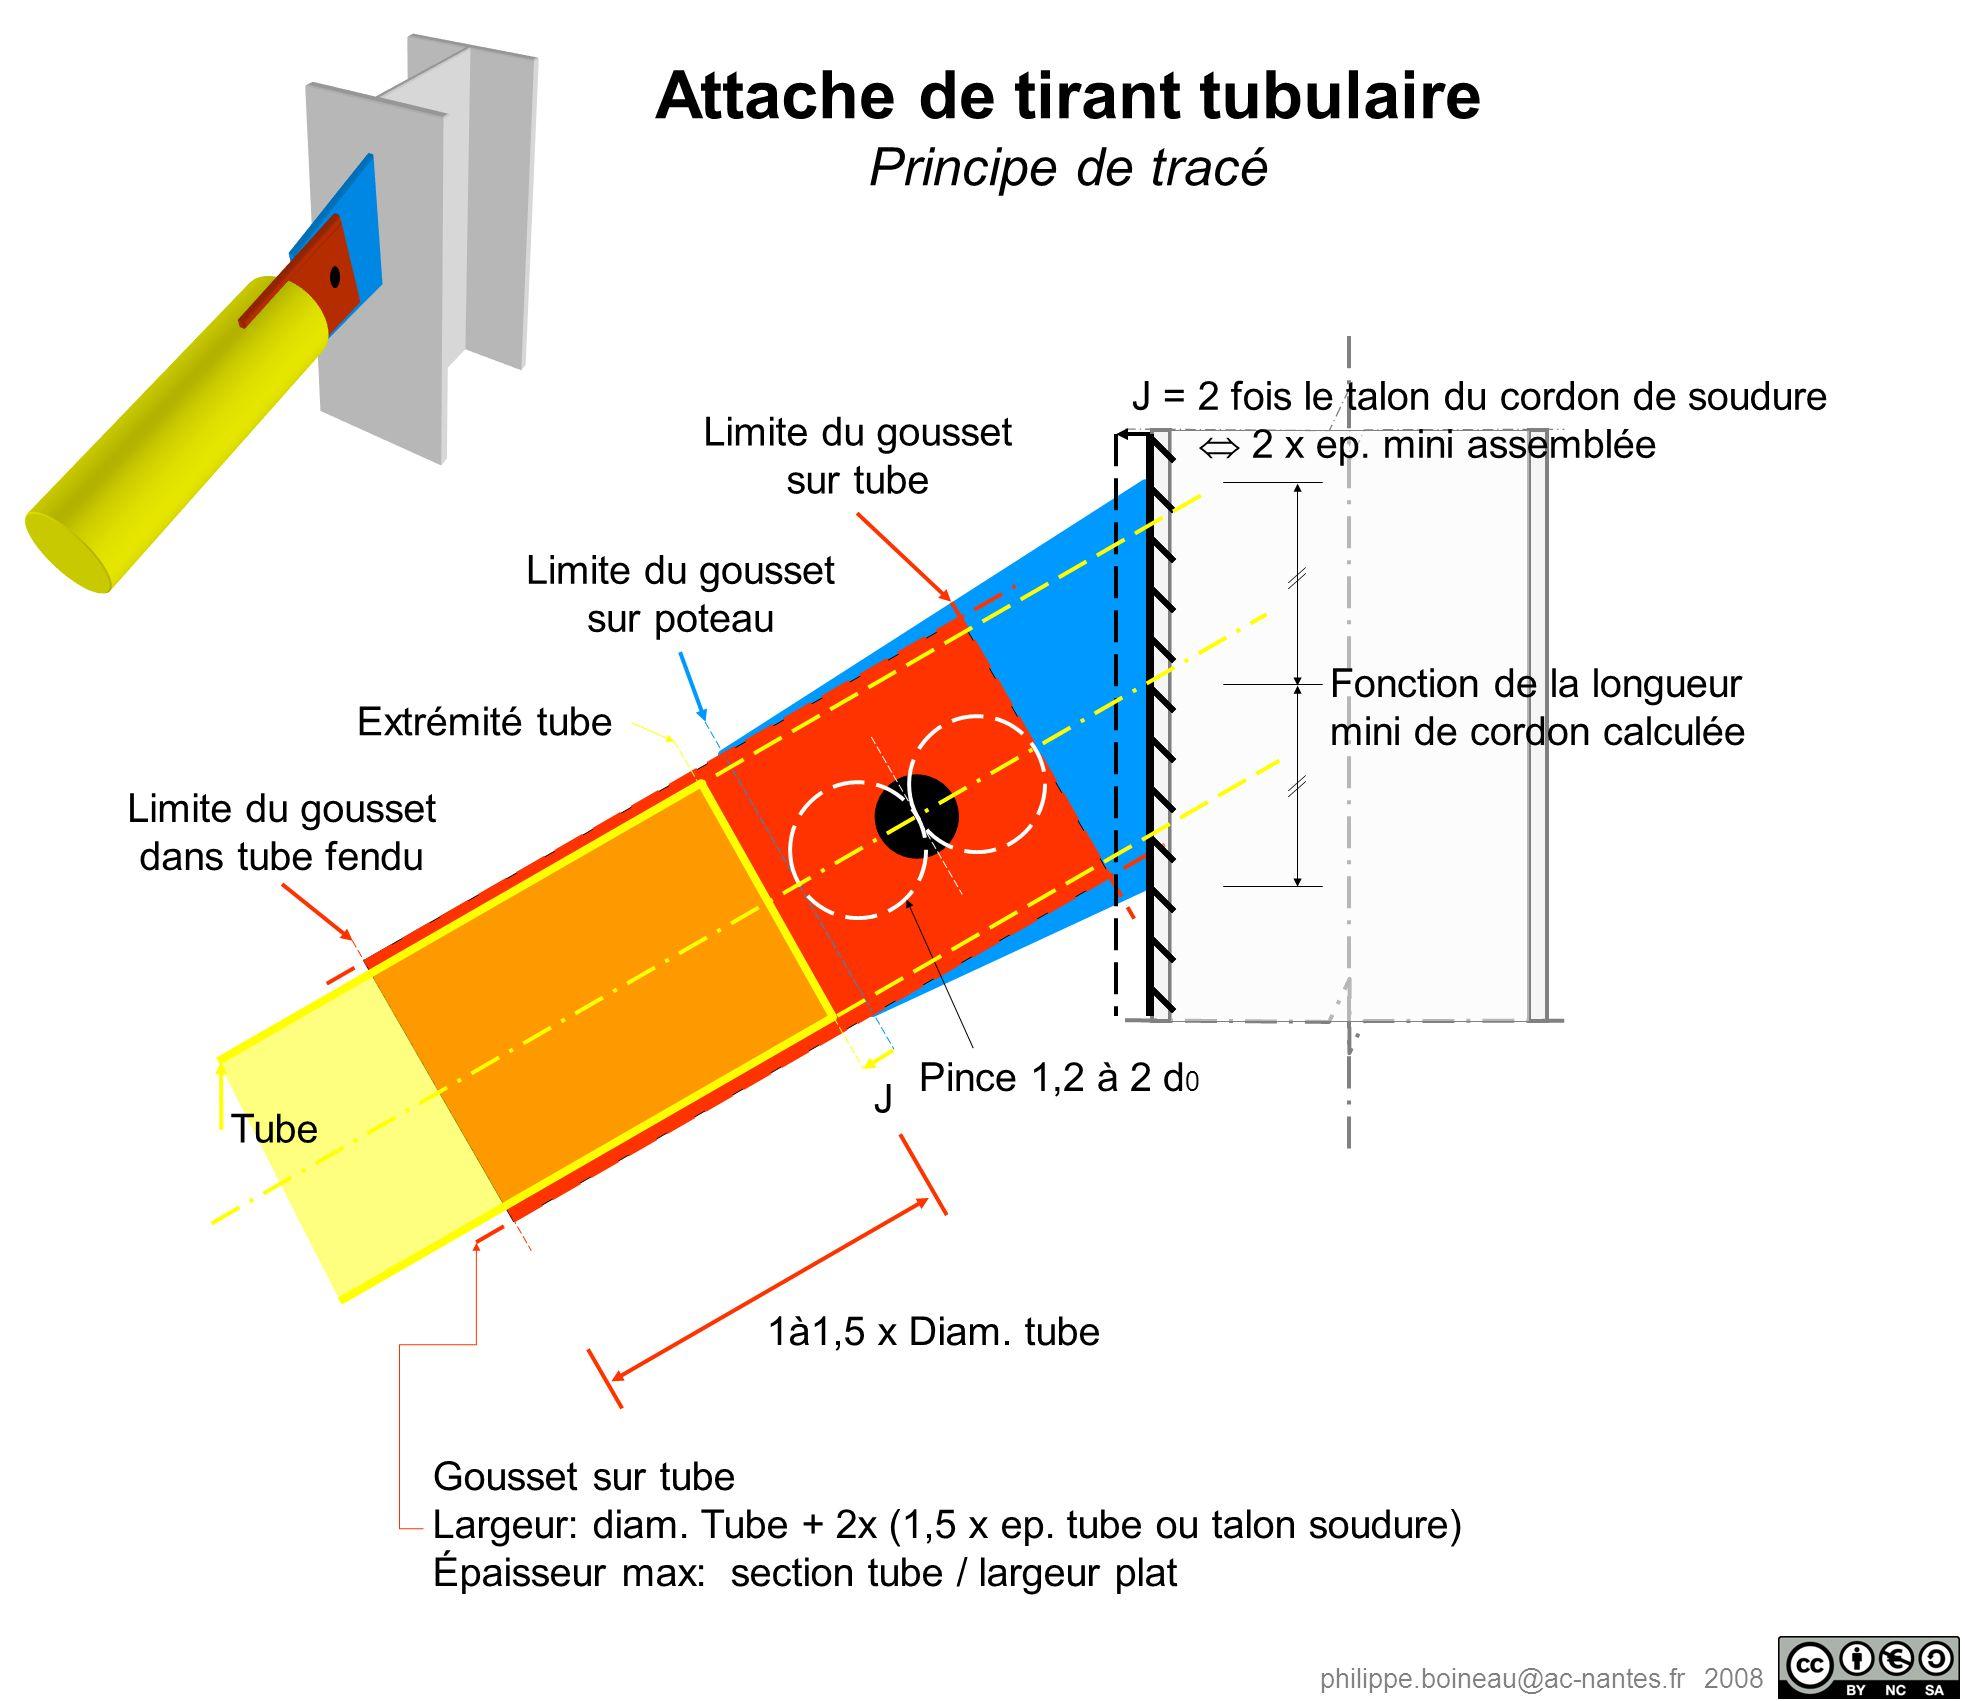 philippe.boineau@ac-nantes.fr 2008 Limite du gousset sur tube Limite du gousset sur poteau Gousset sur tube Largeur: diam. Tube + 2x (1,5 x ep. tube o